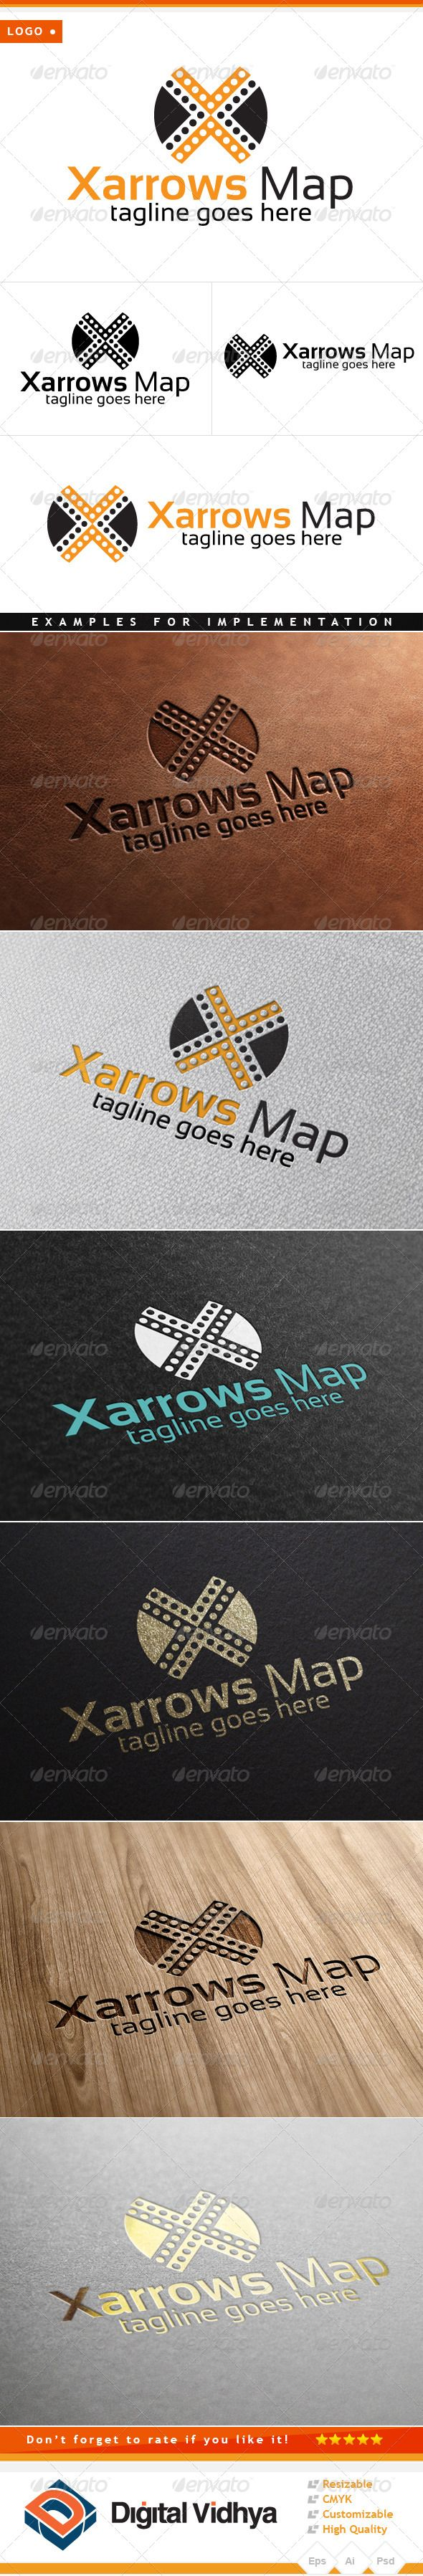 X Letter Arrows Logo Arrow Logo Arrow Symbol Text And Arrow